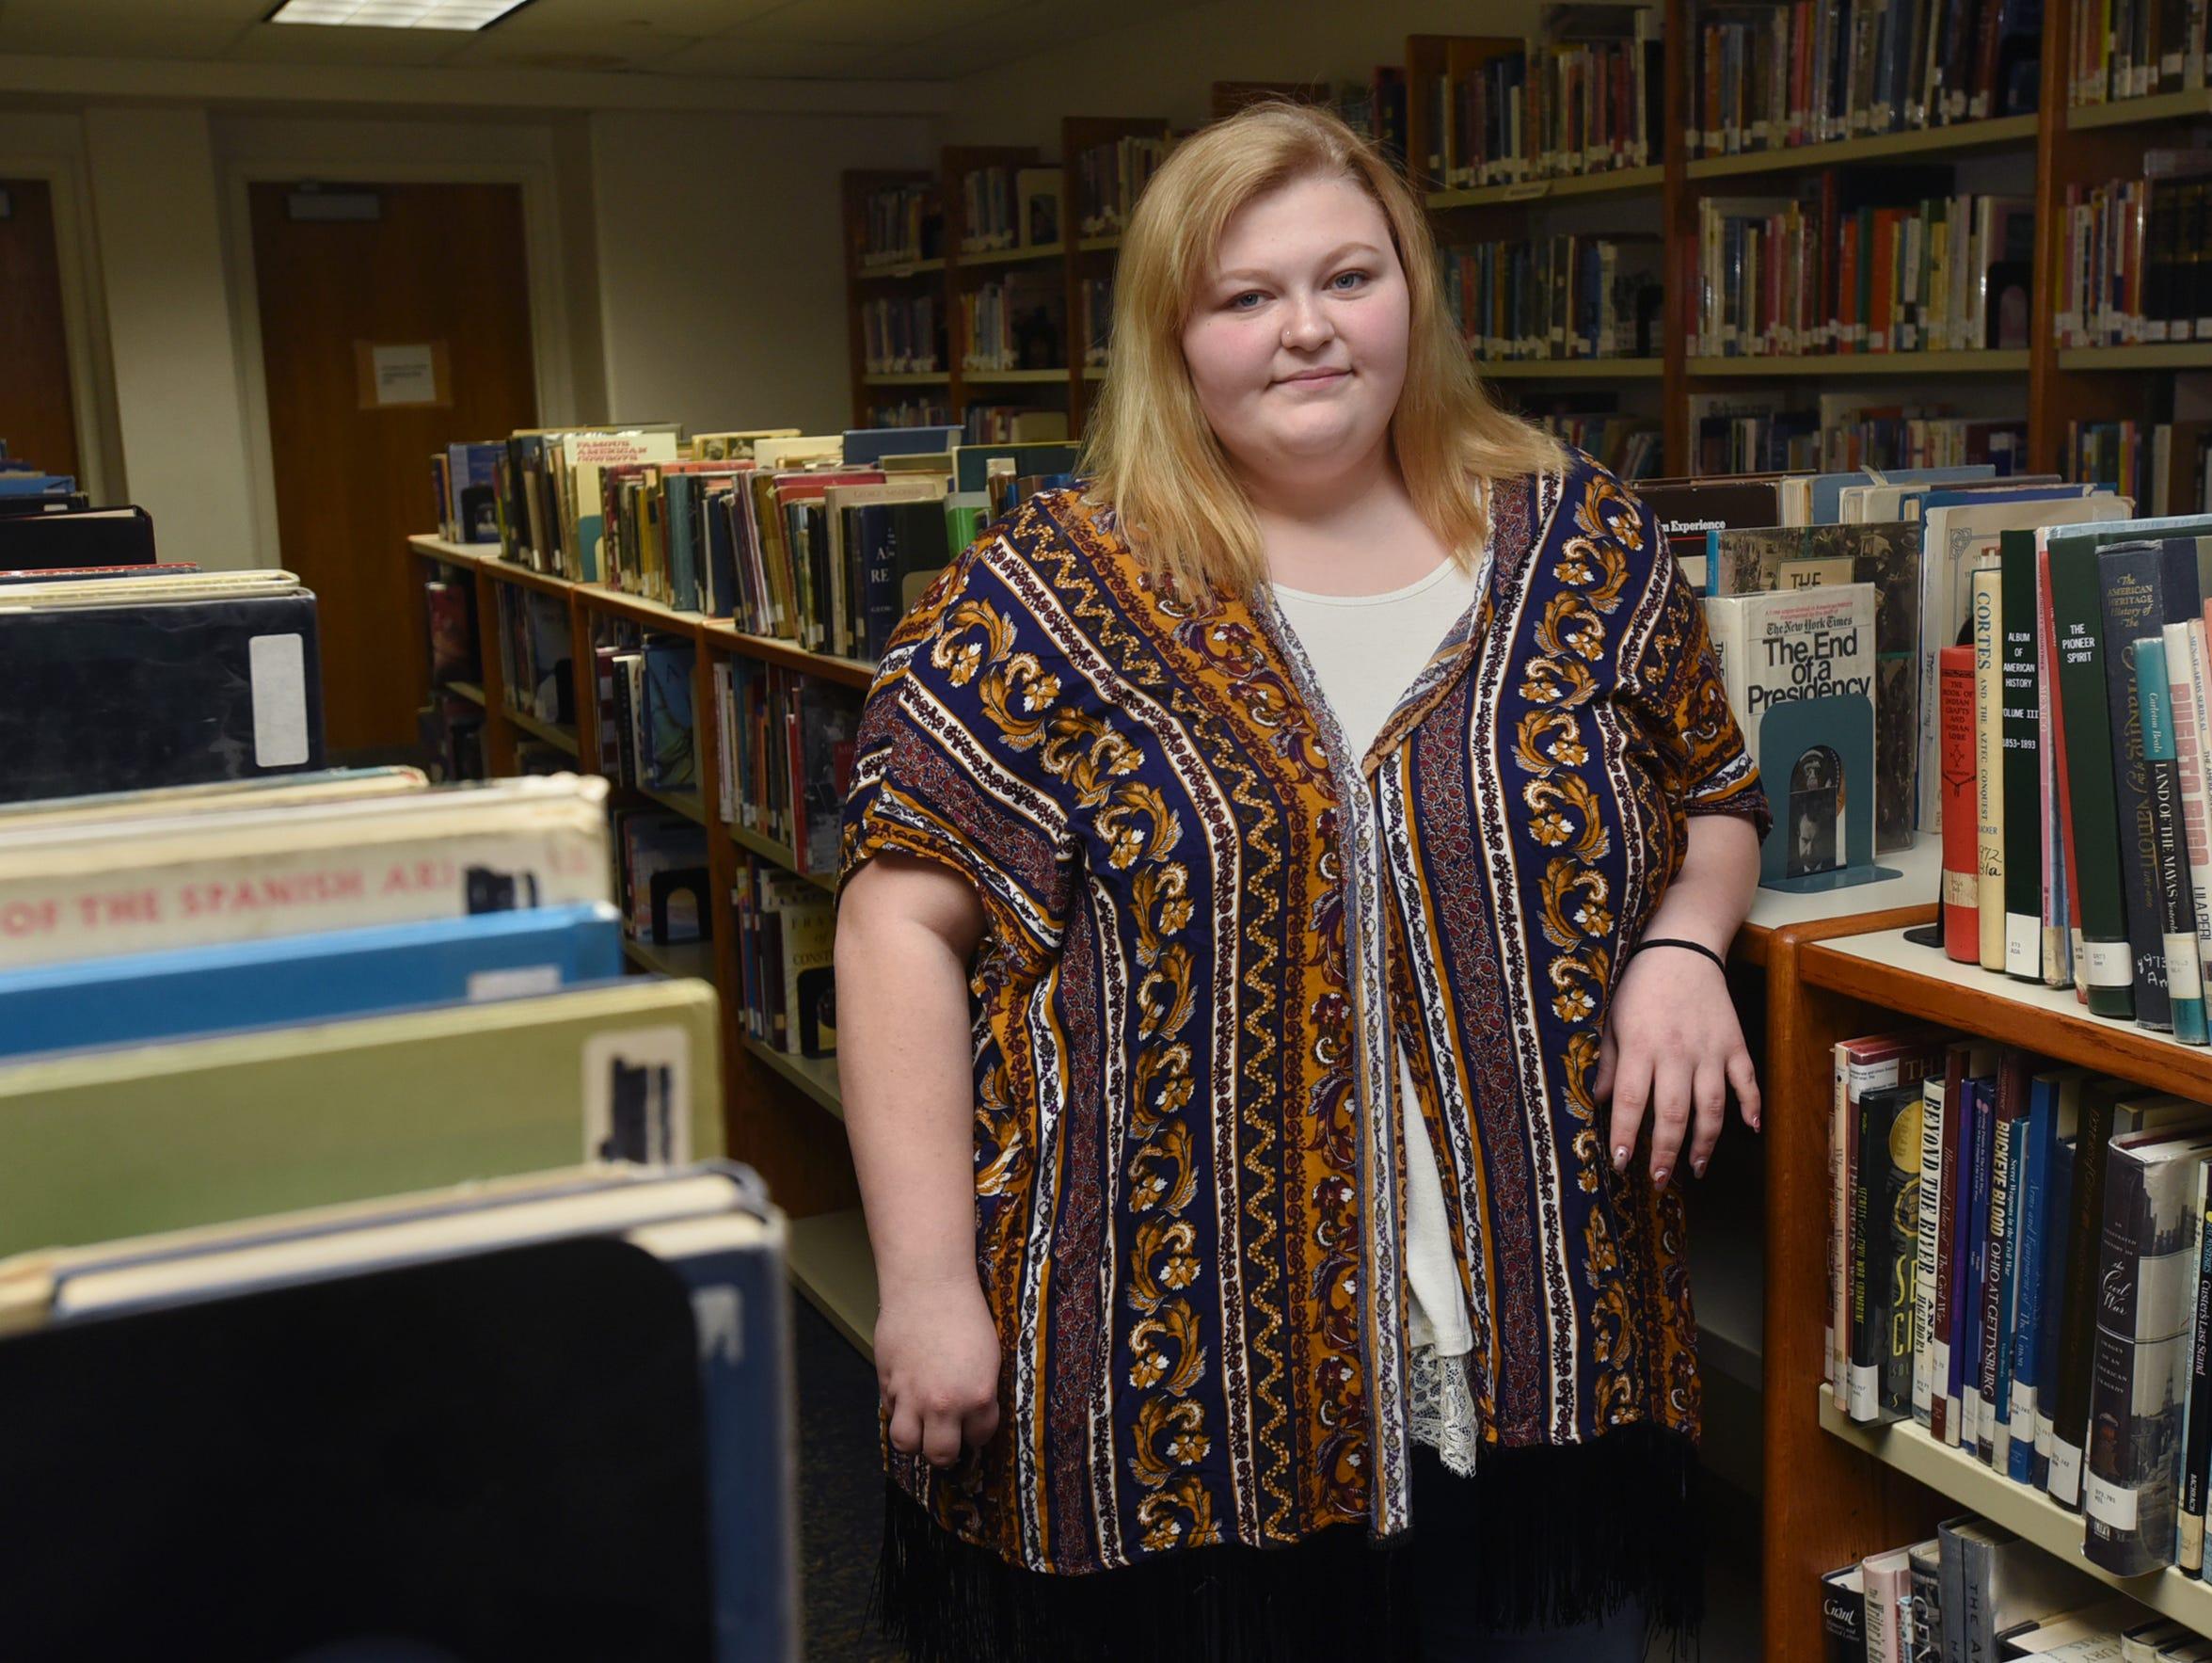 Caeley Blanton has parents who had addiction problems